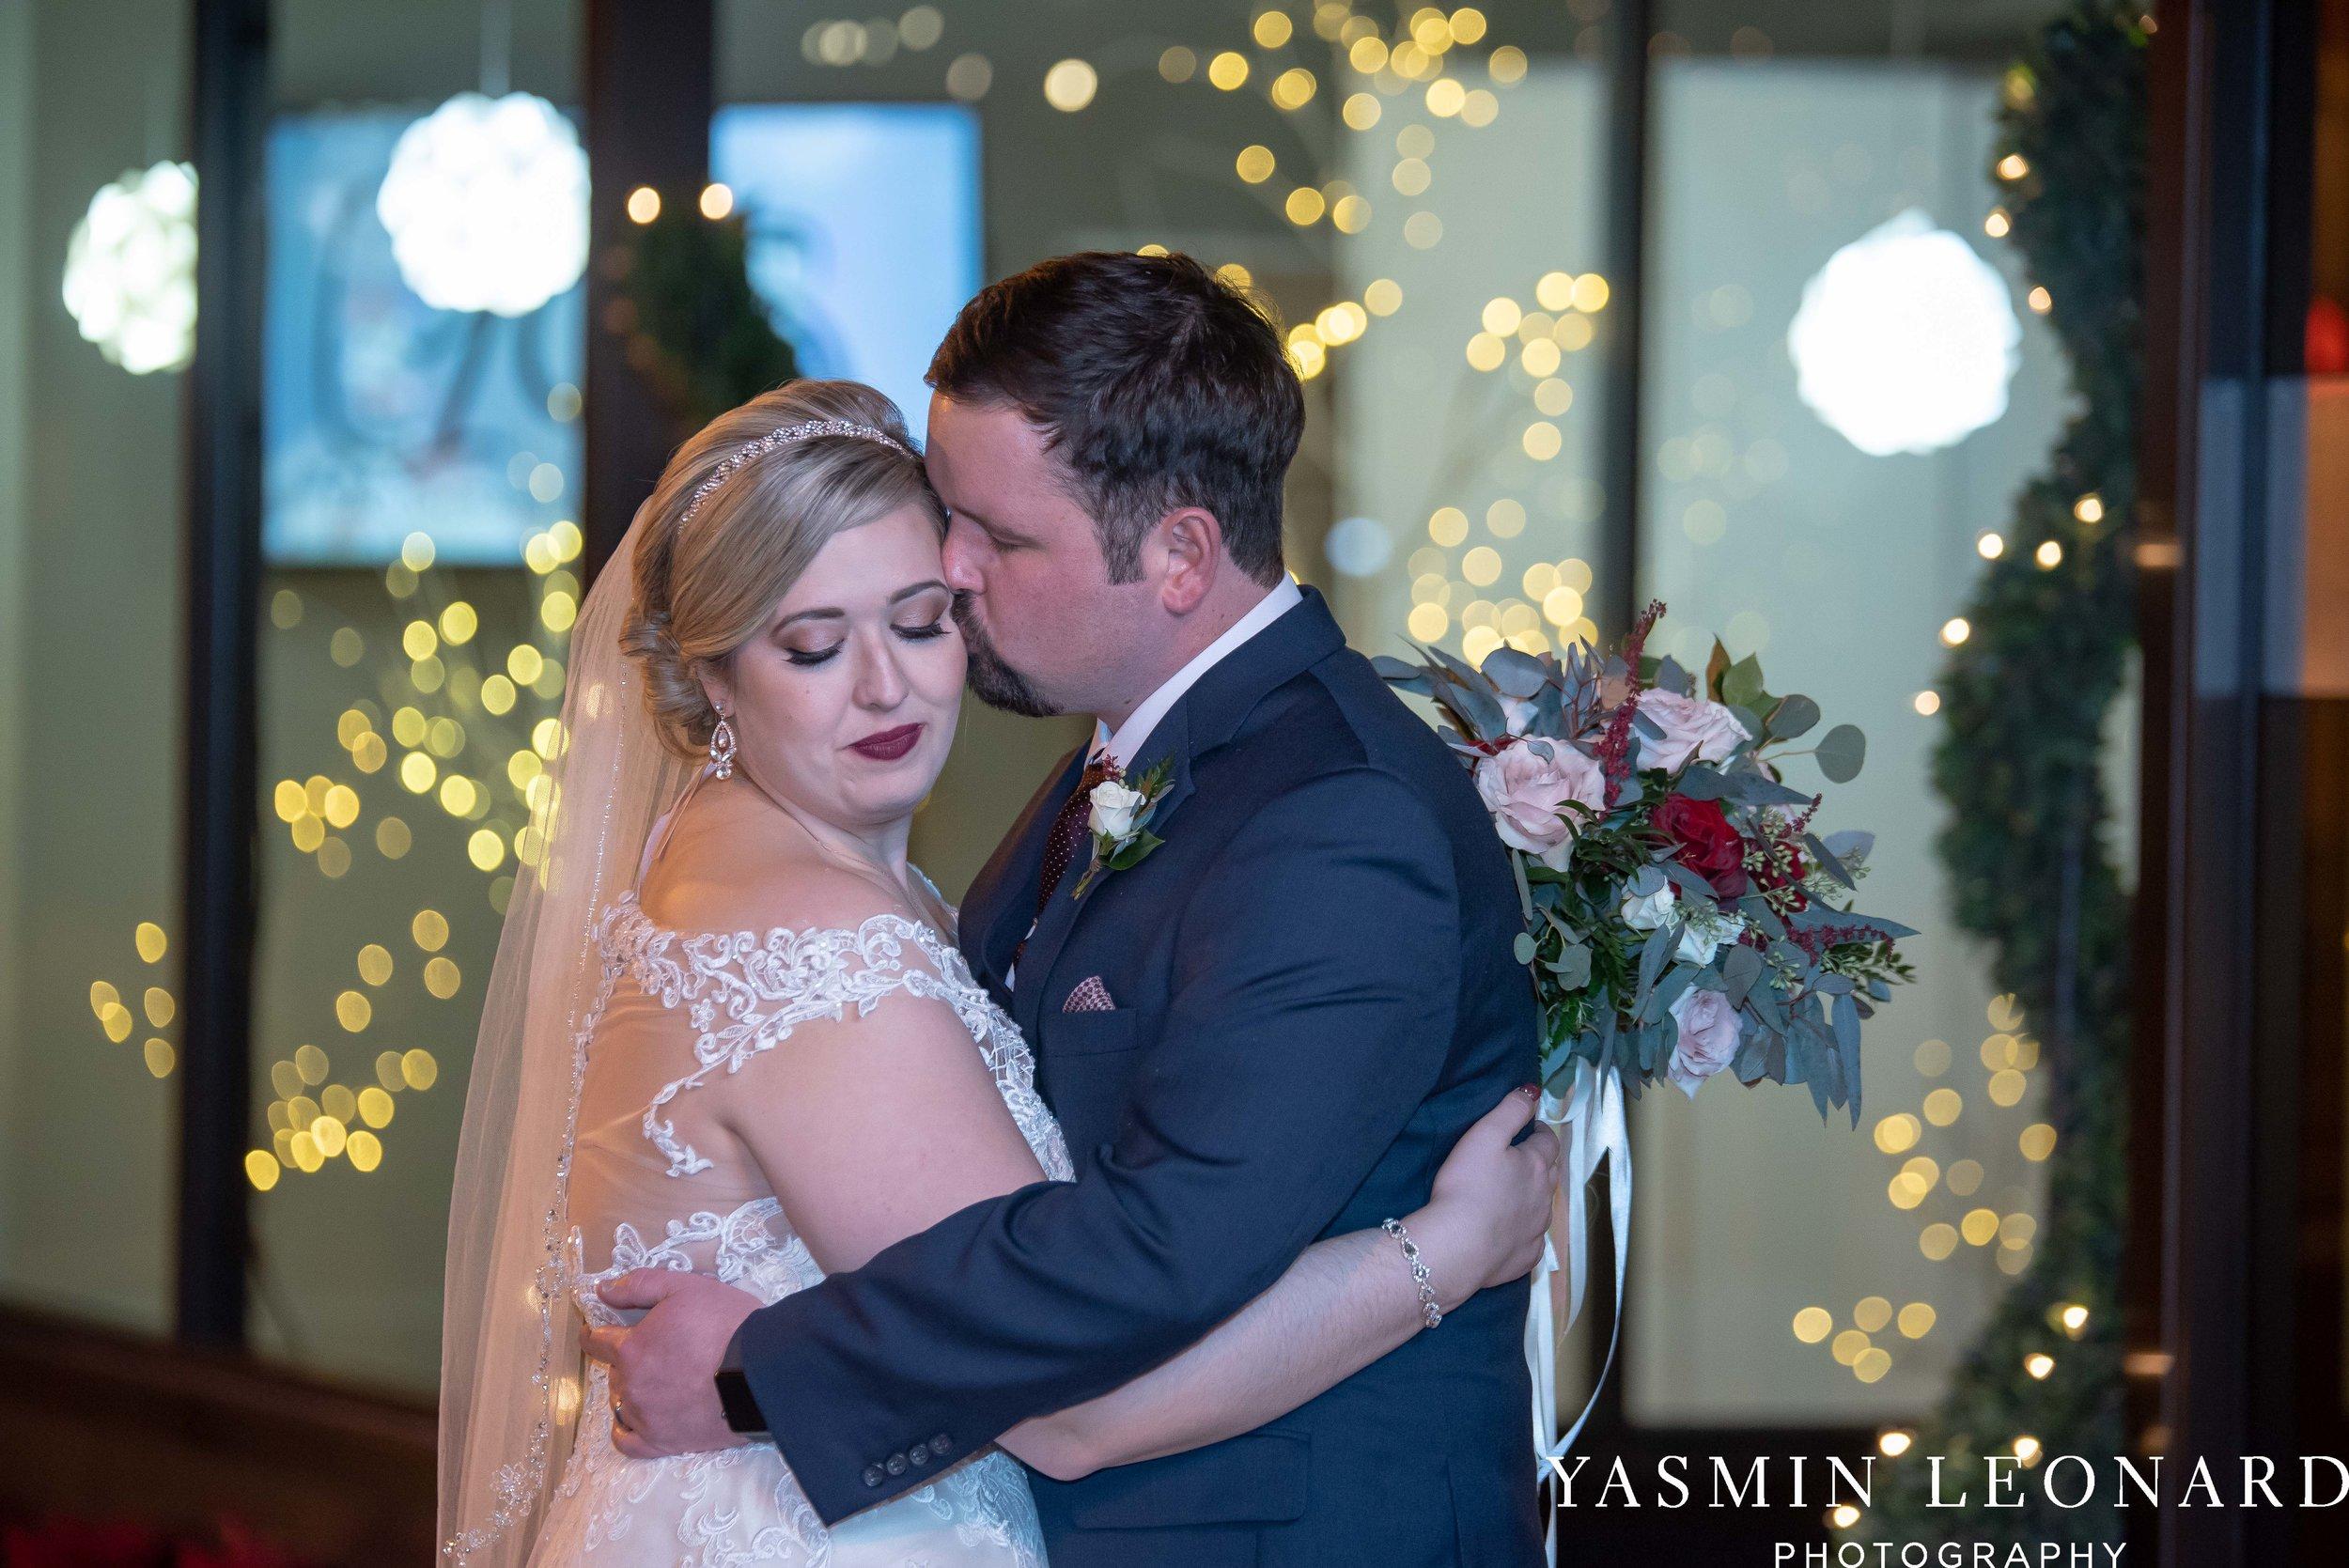 Rebekah and Matt - 105 Worth Event Centre - Yasmin Leonard Photography - Asheboro Wedding - NC Wedding - High Point Weddings - Triad Weddings - Winter Wedding-39.jpg